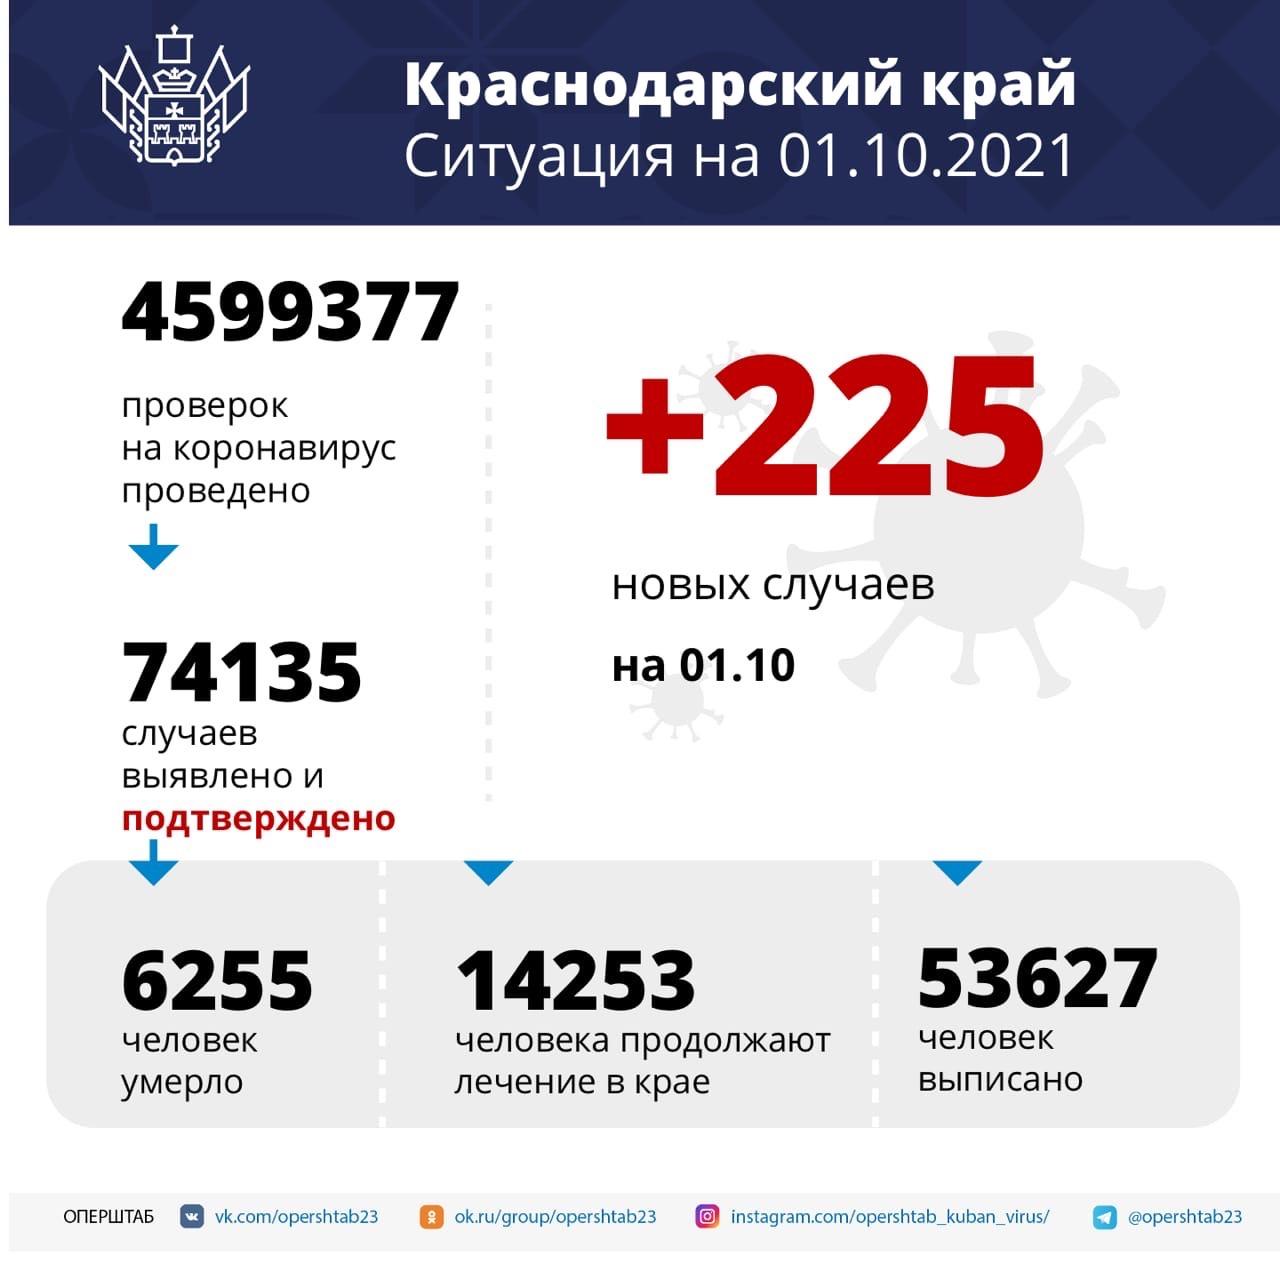 За сутки на Кубани выявили 225 случаев COVID-19Среди...